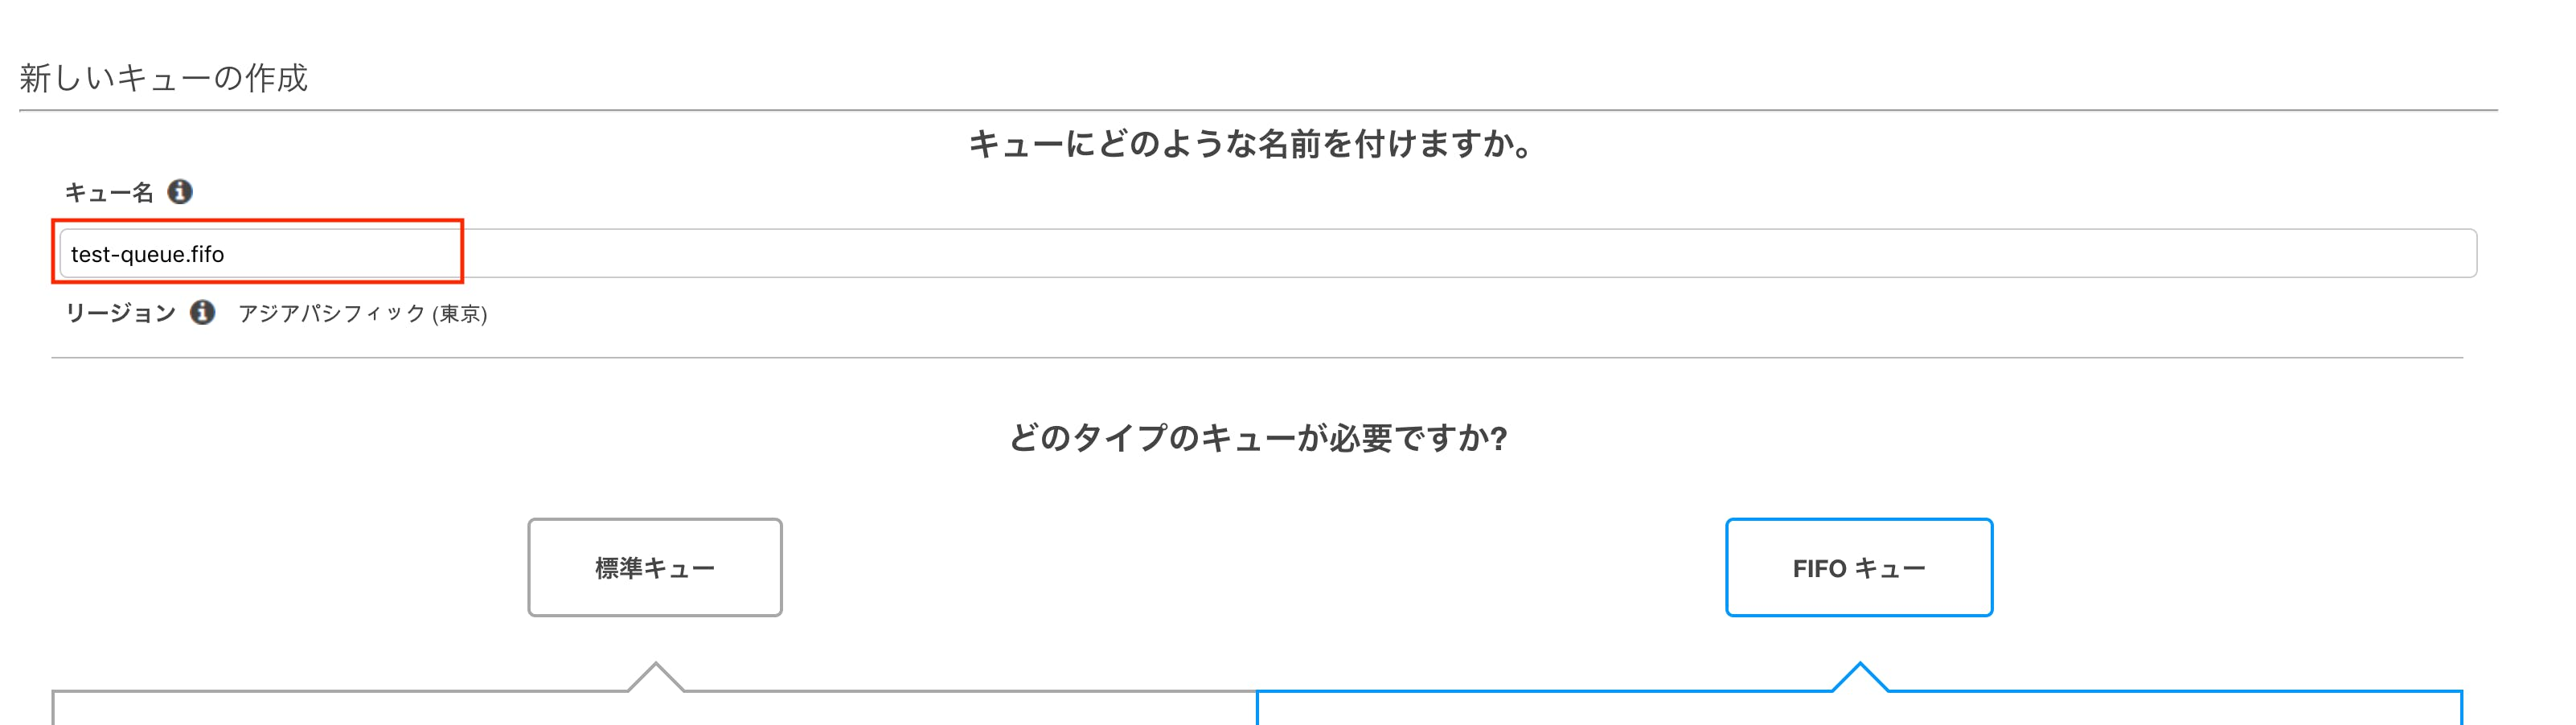 queue_name.png